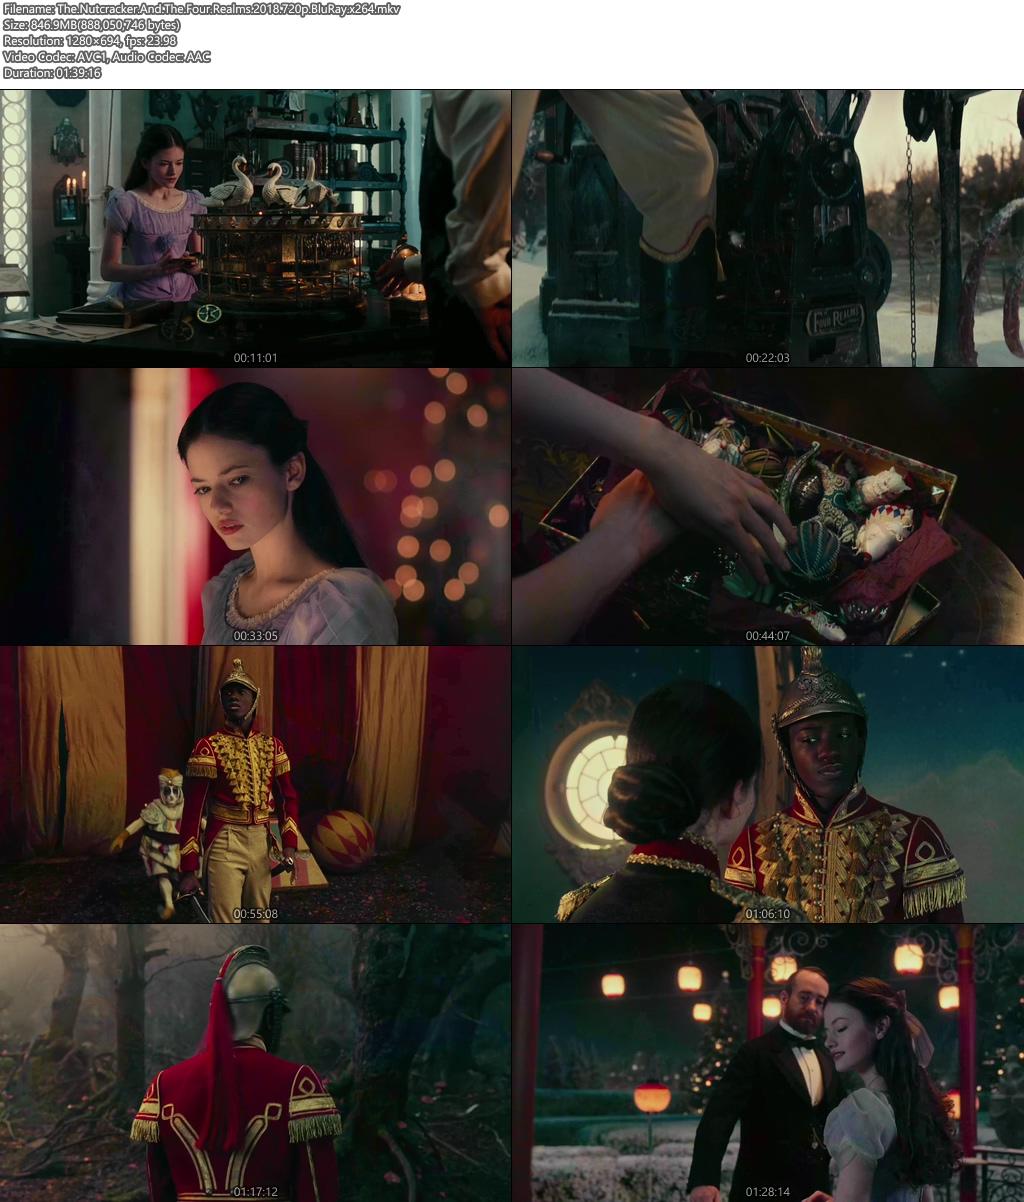 The Nutcracker And The Four Realms 2018 720p BluRay x264   480p 300MB   100MB HEVC Screenshot